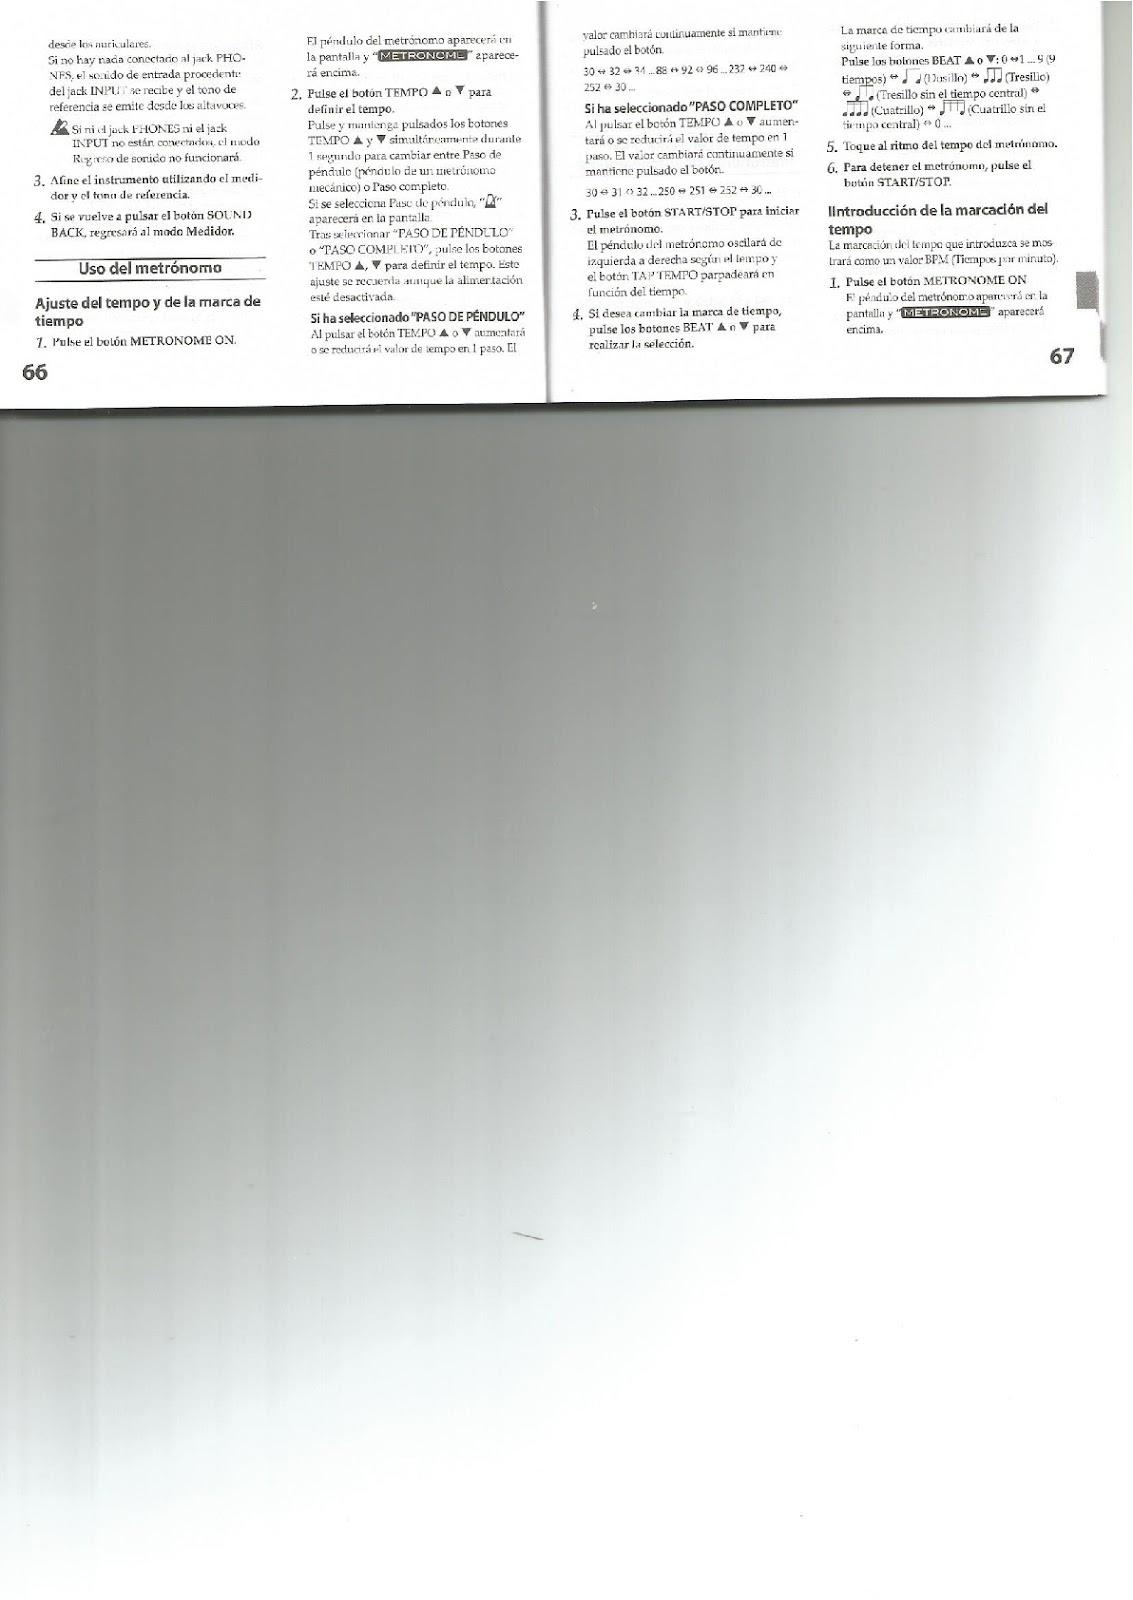 manuaisequiposPDF-024.jpg